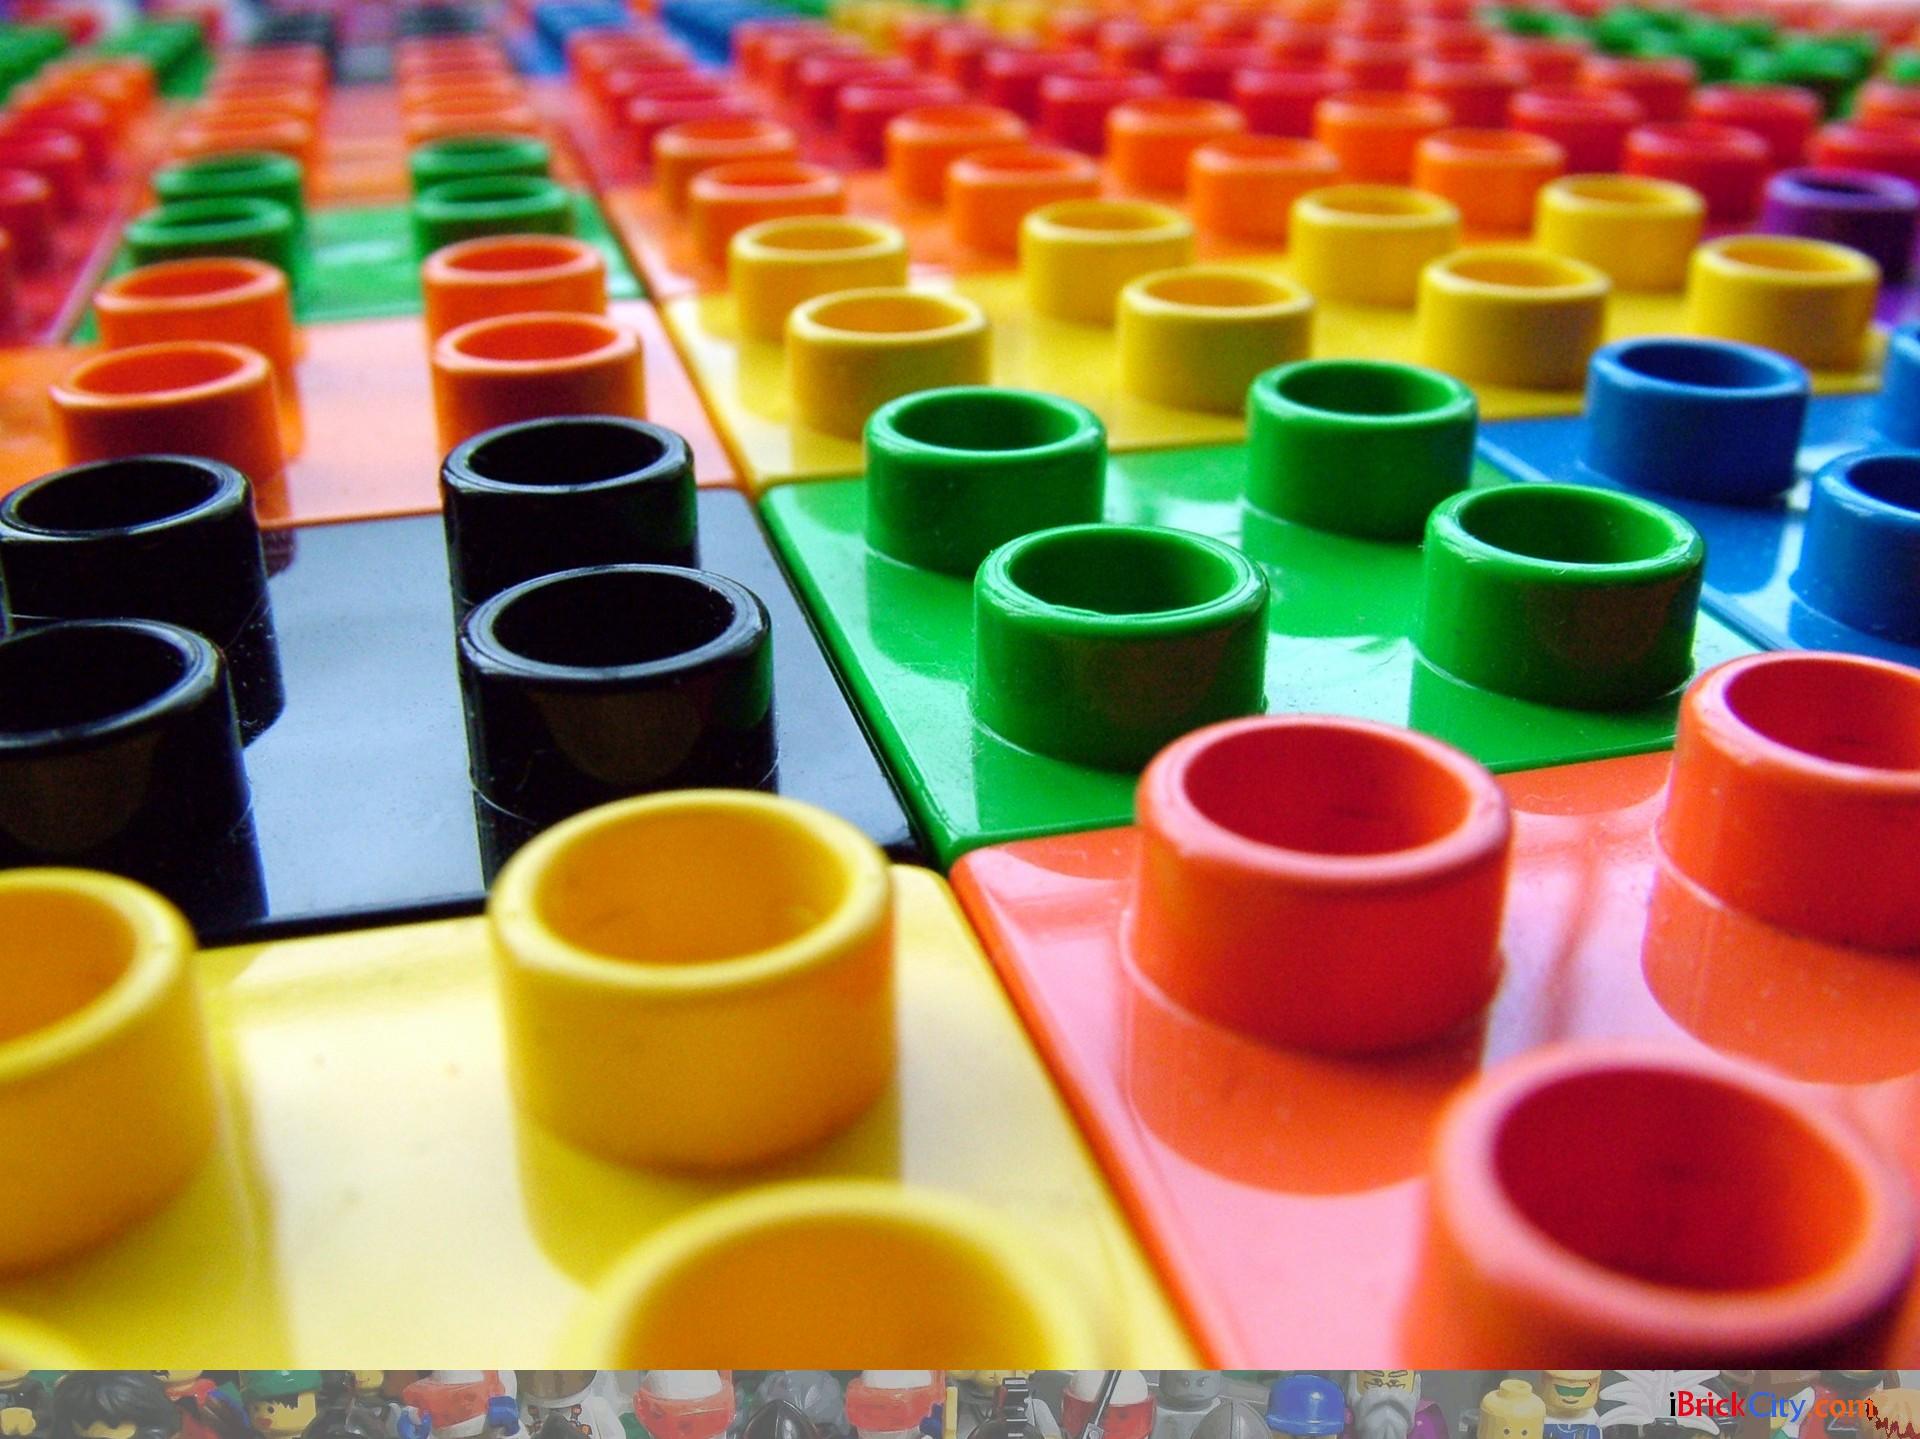 lego-wallpaper-pack-1-ibrickcity-10